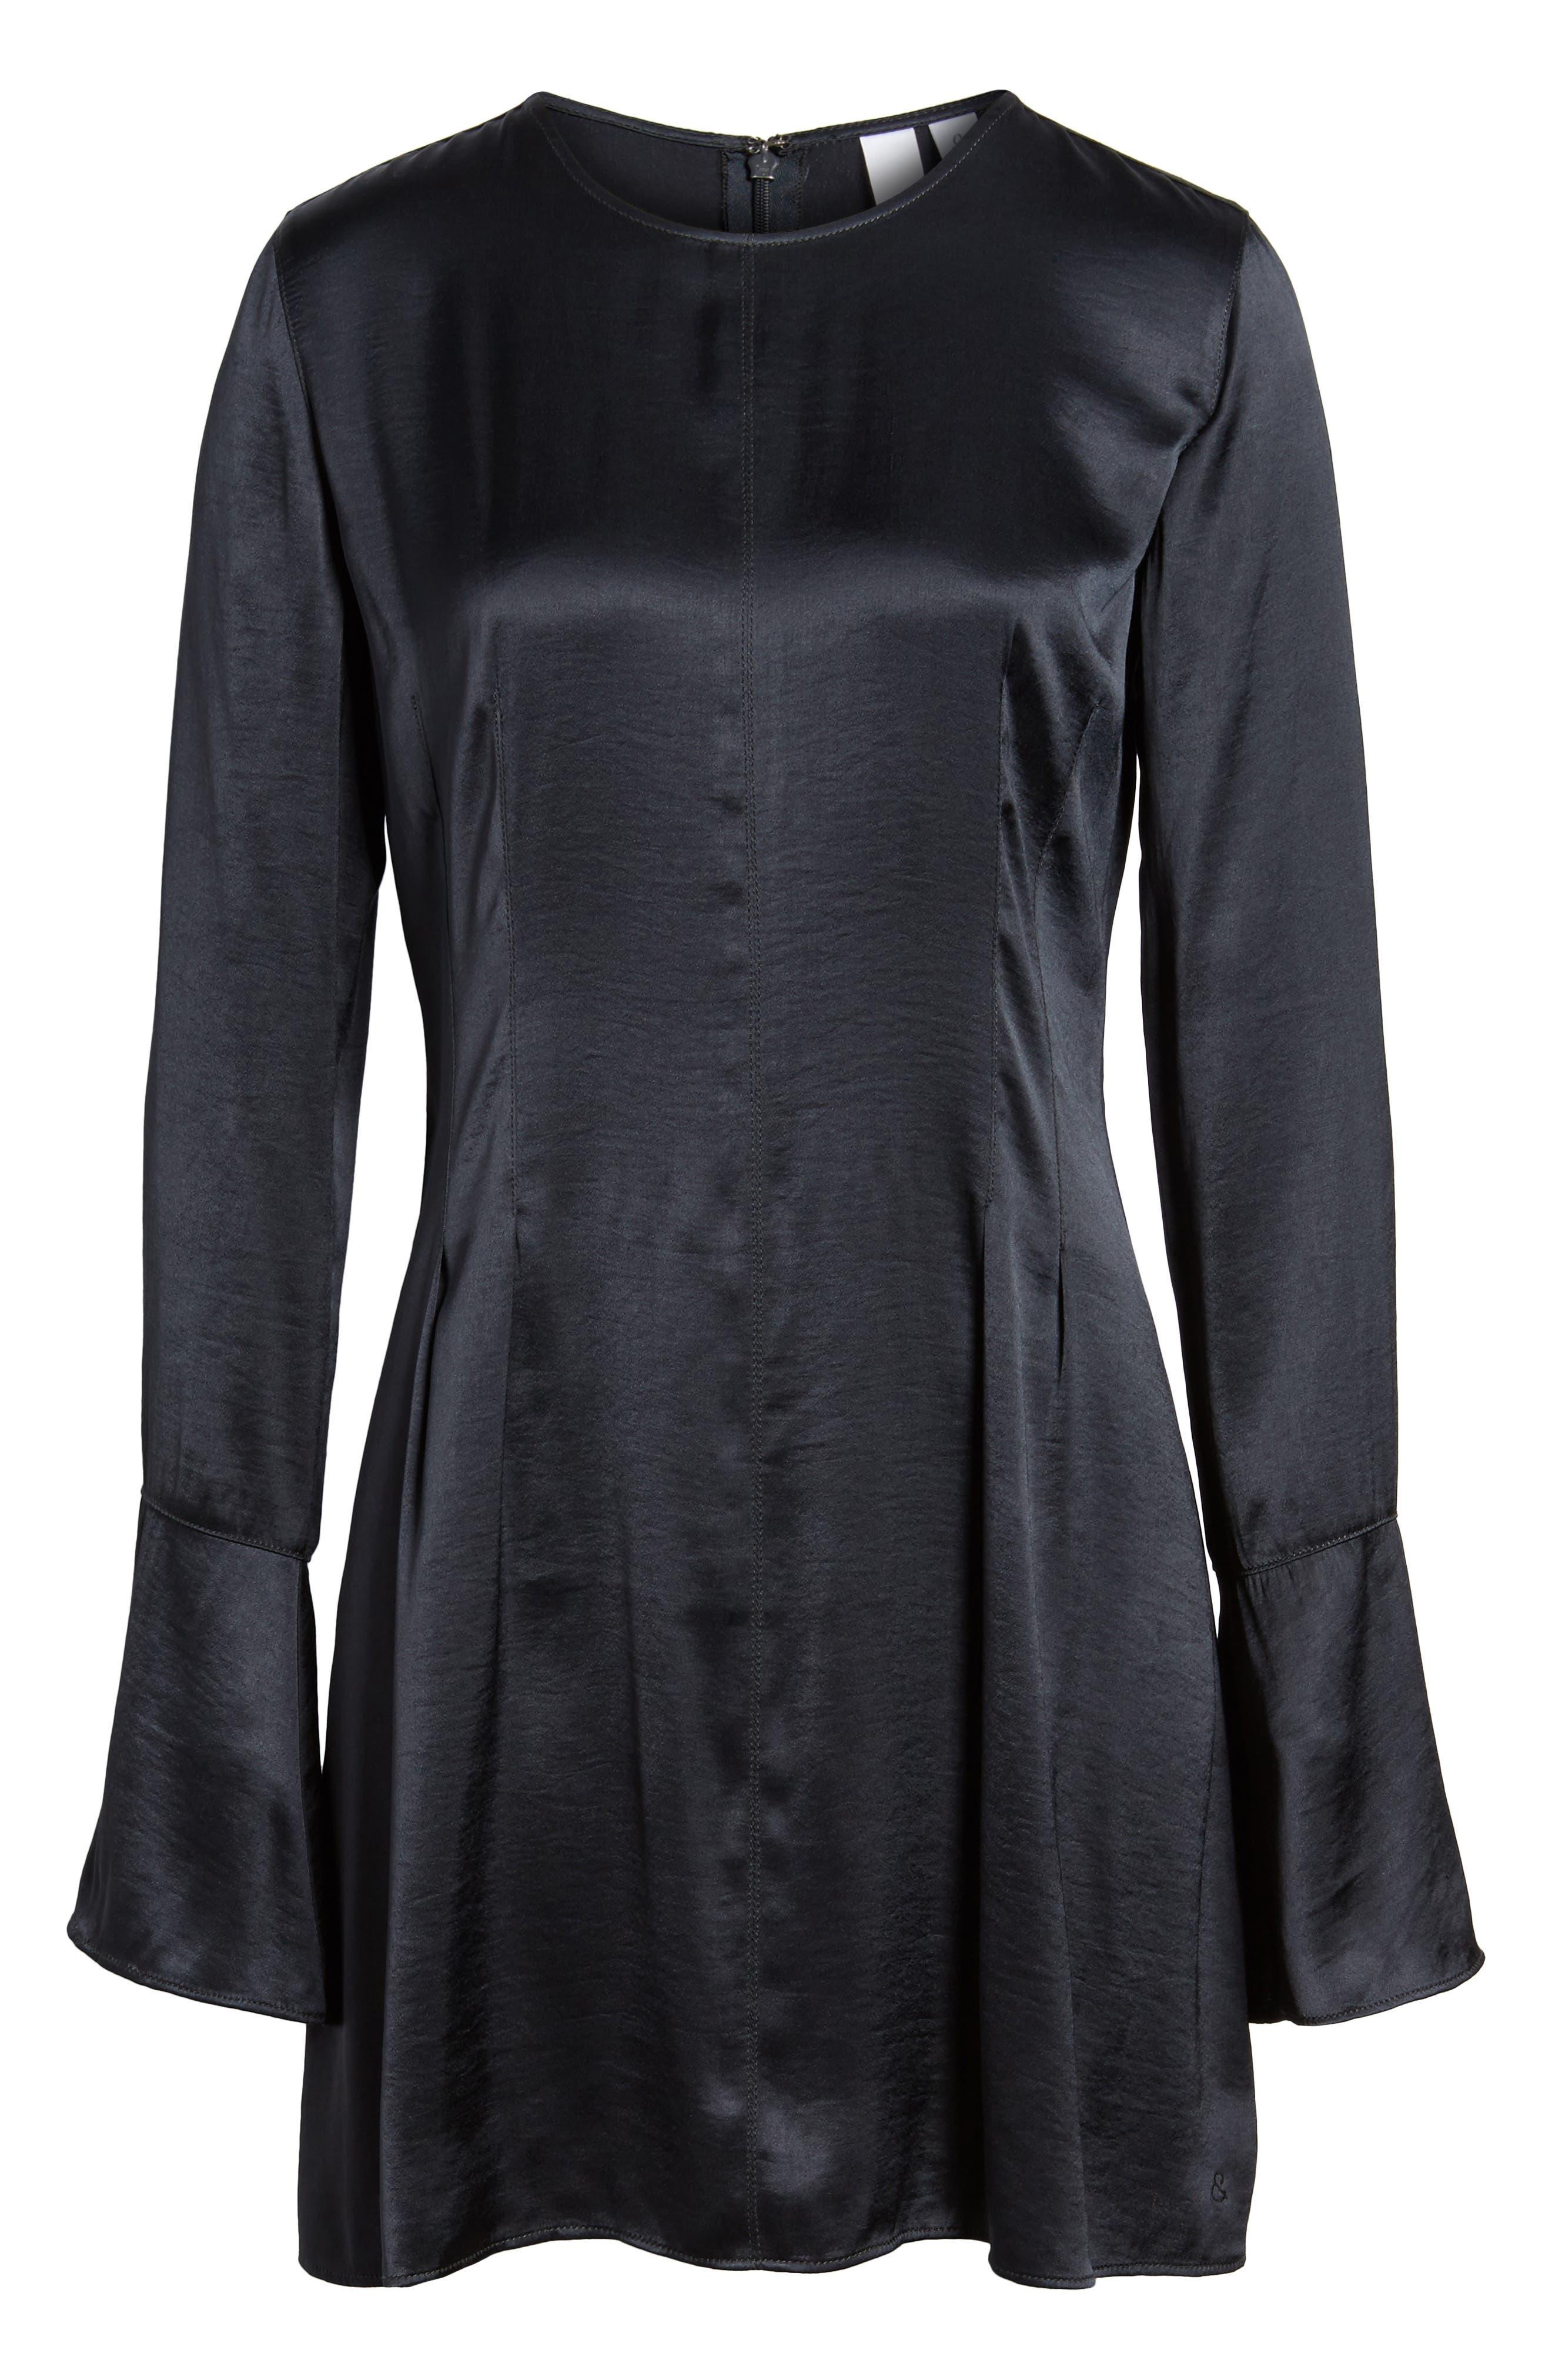 x Something Navy Bell Sleeve Minidress,                             Alternate thumbnail 8, color,                             Grey Phantom